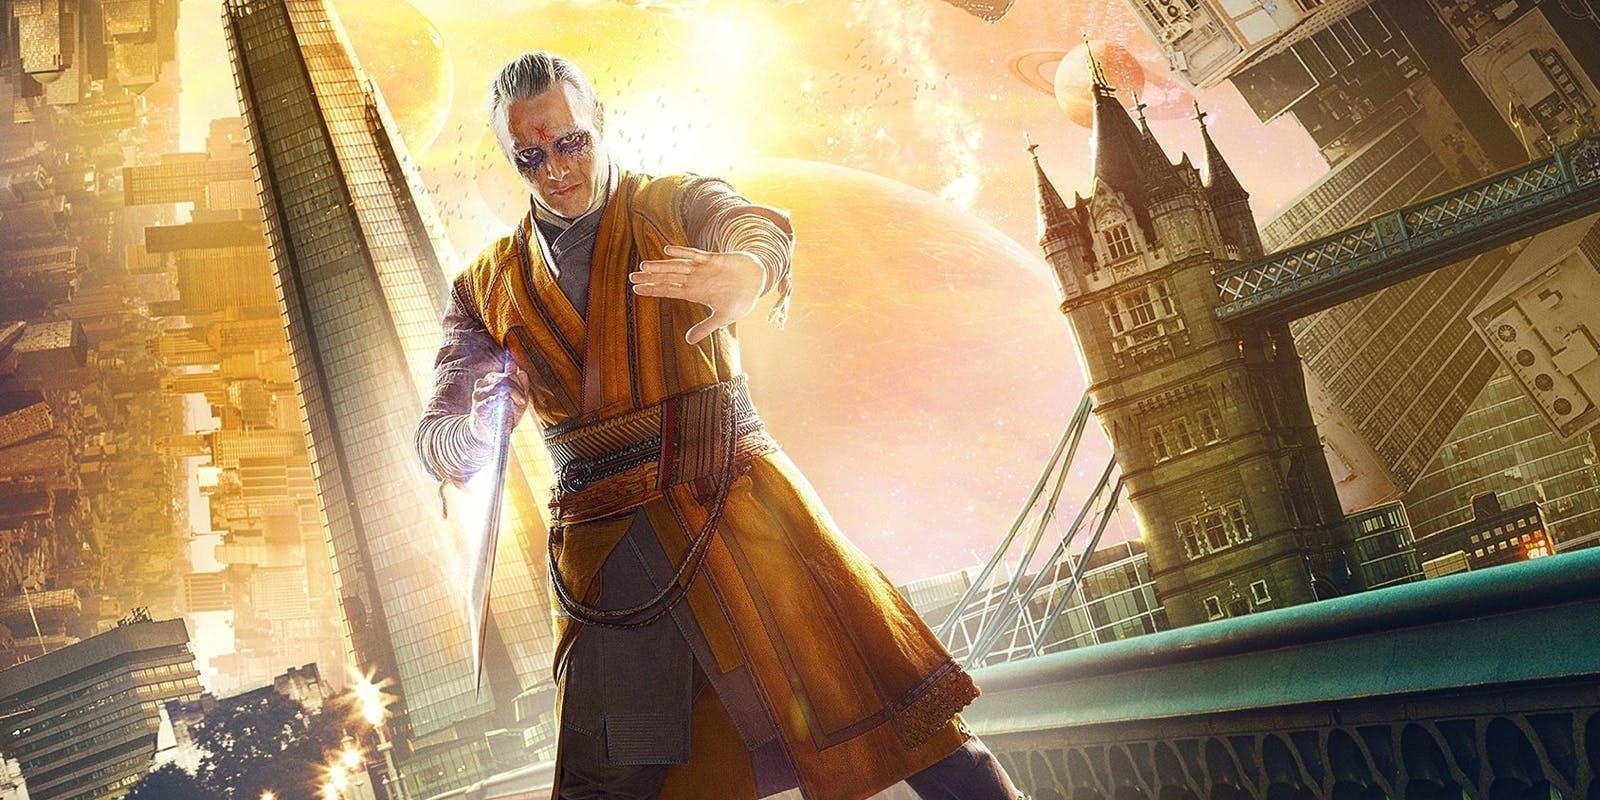 Doctor Strange's Enemy Kaecilius Is an Evolving Villain and Demon Summoner